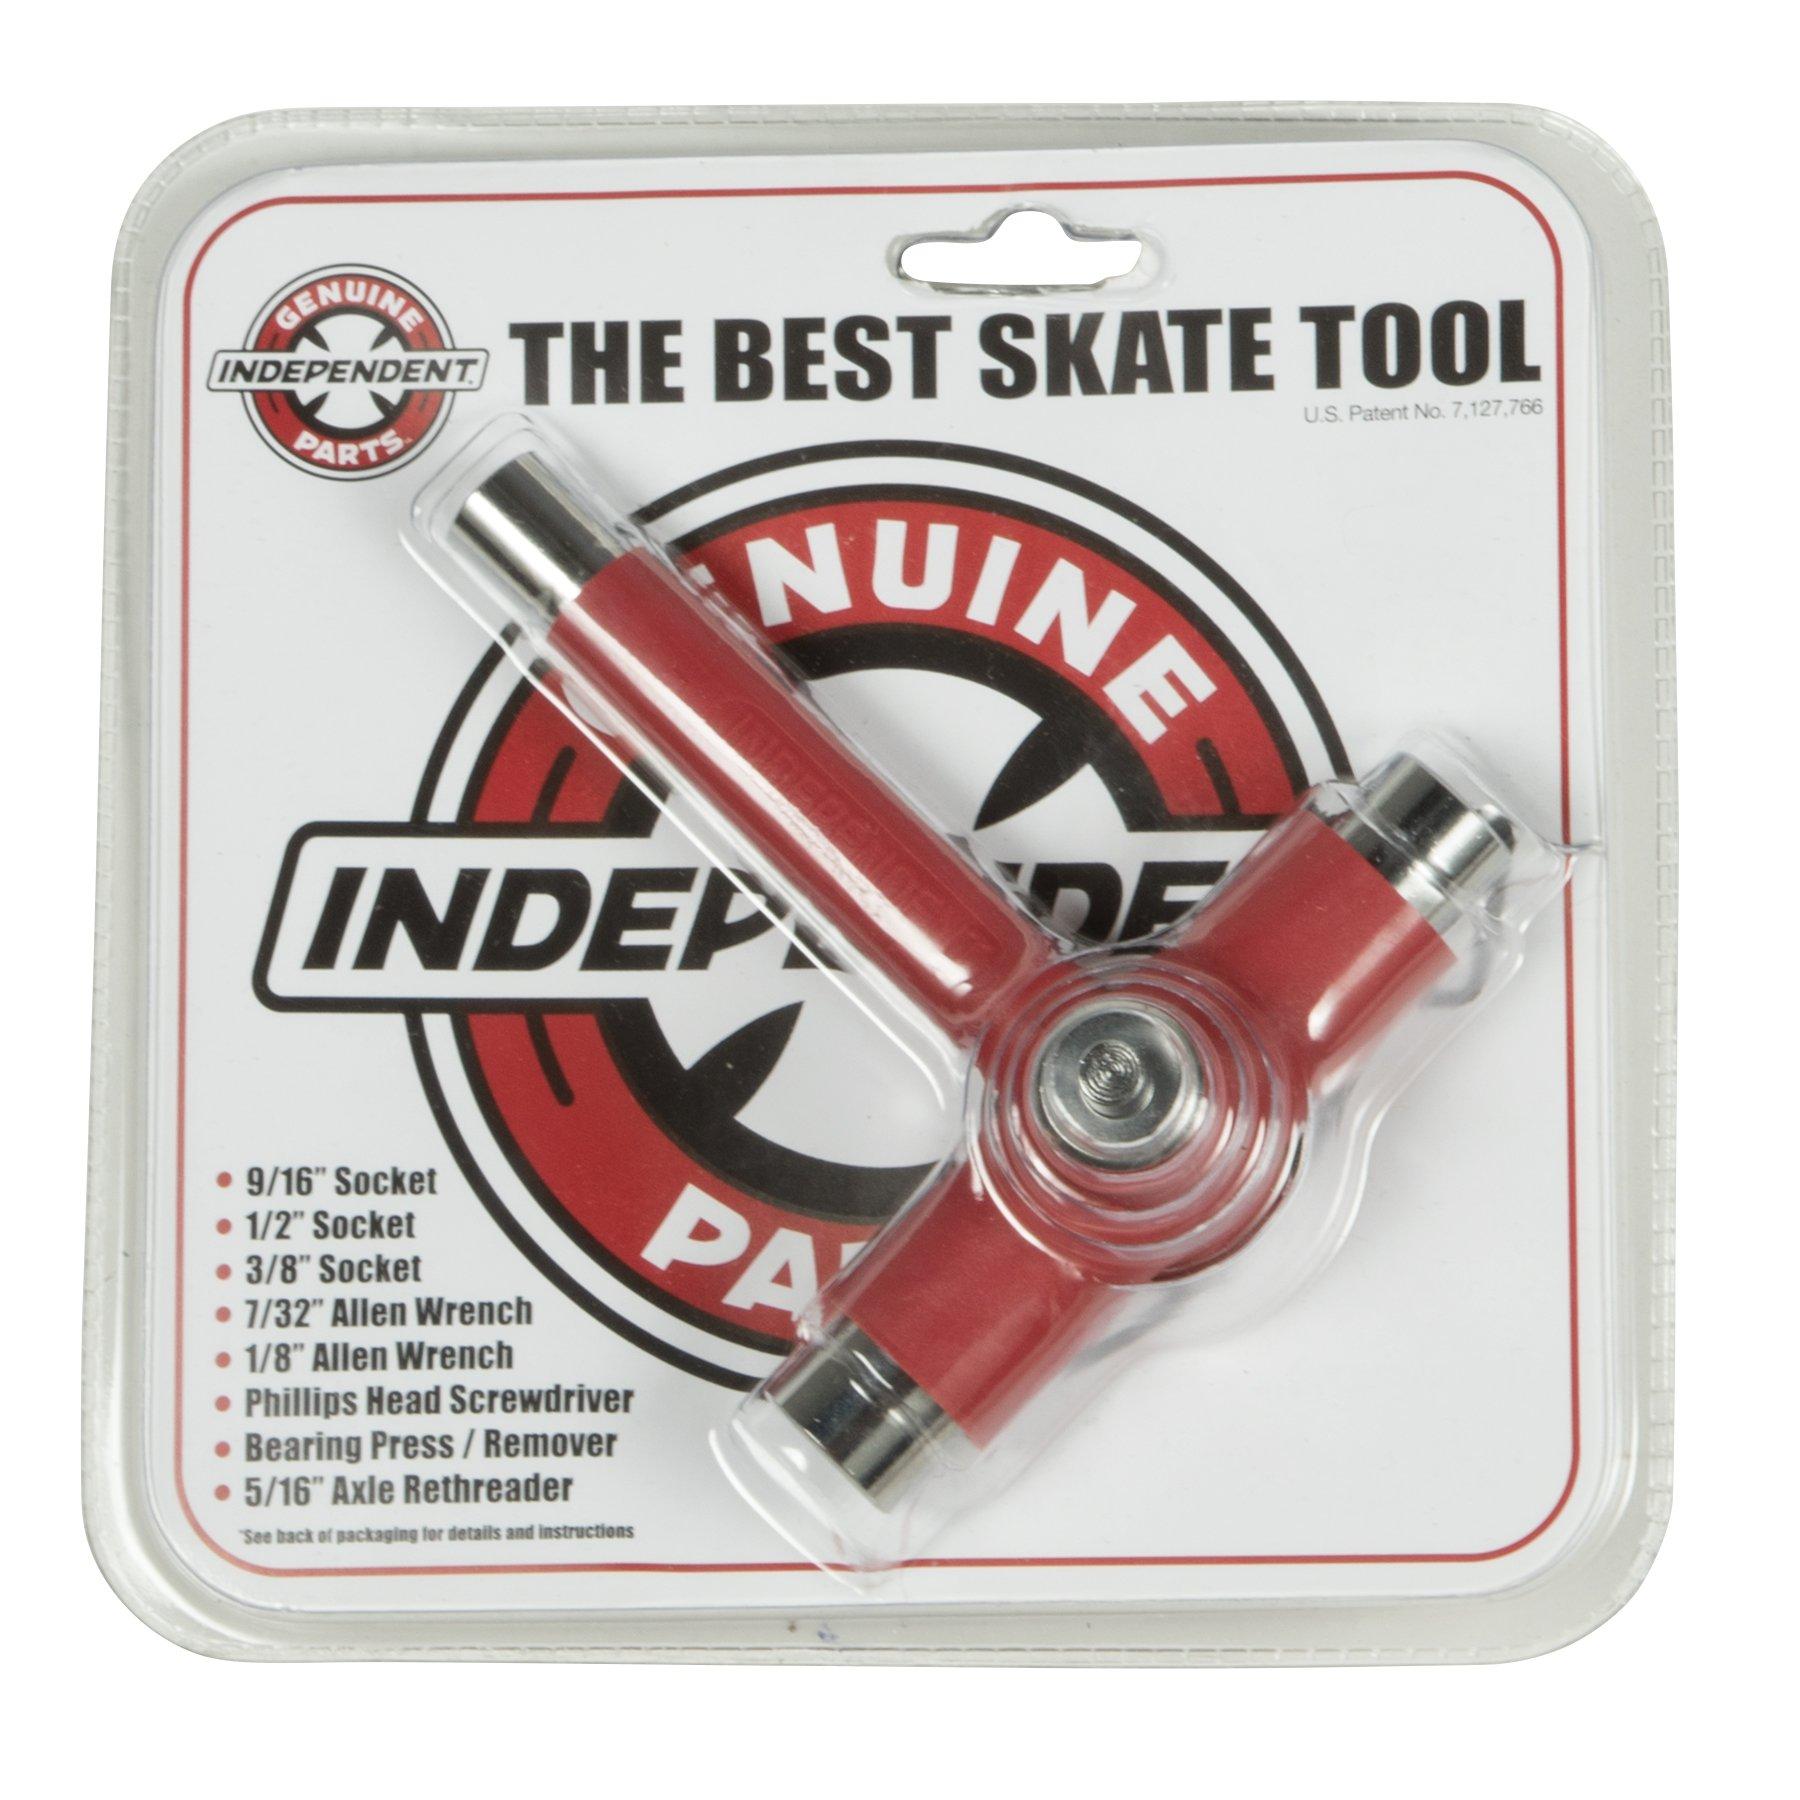 Independent Best Skate Tool Red Skate Tools